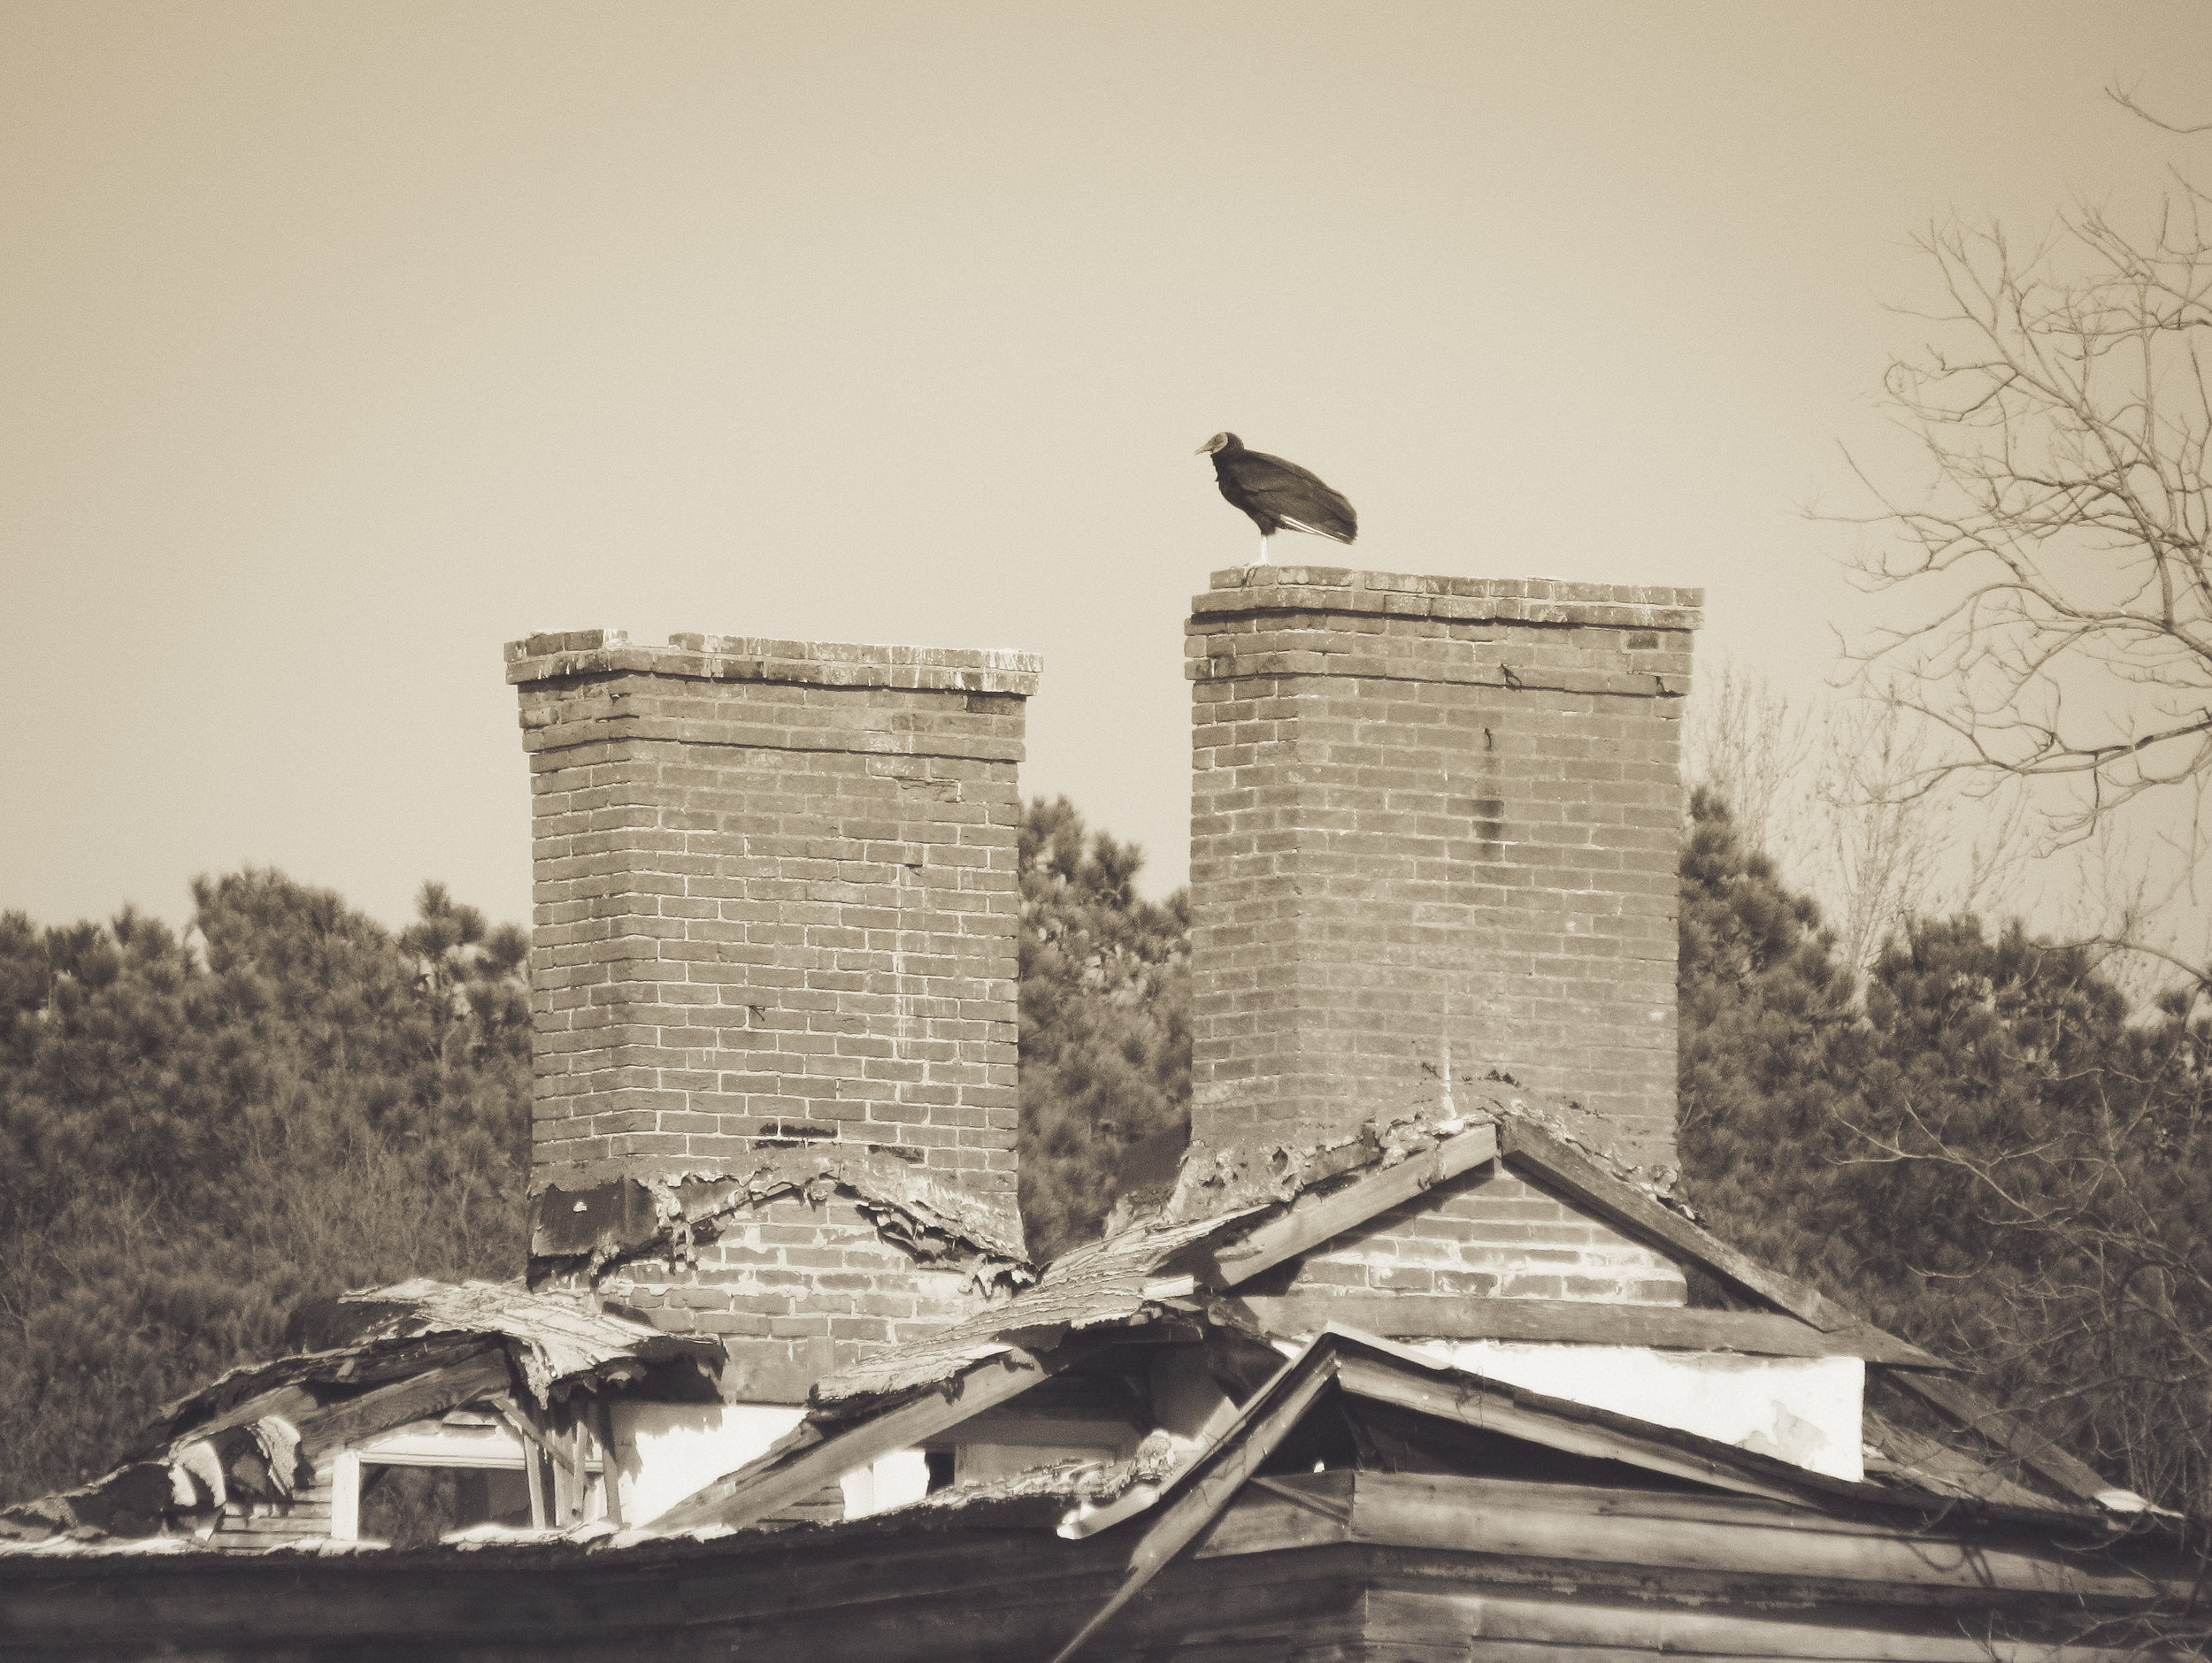 Domestic Ruin and Vulture Photo: Rose Anderson, 2012